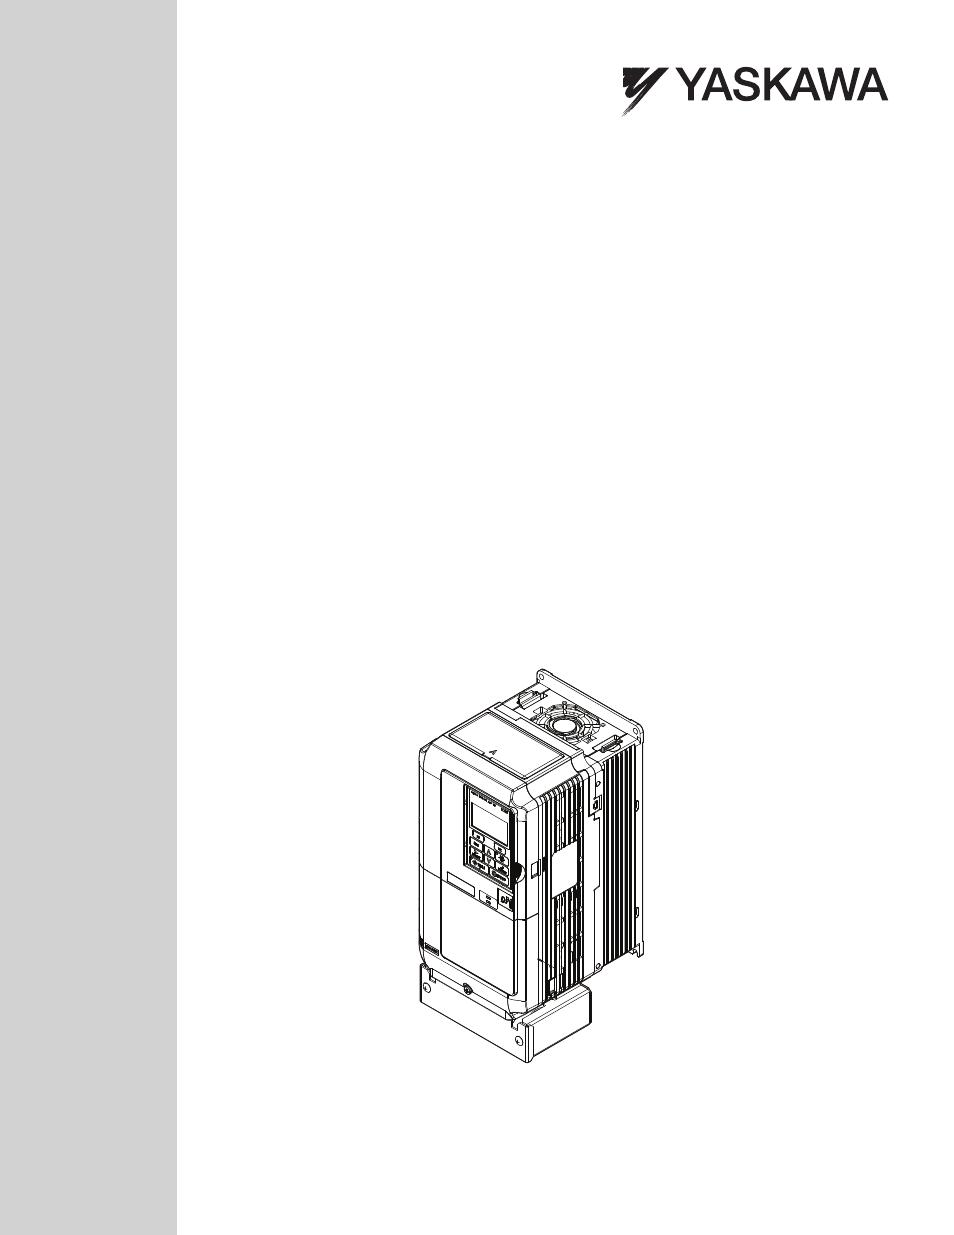 A1000 manual pdf yaskawa